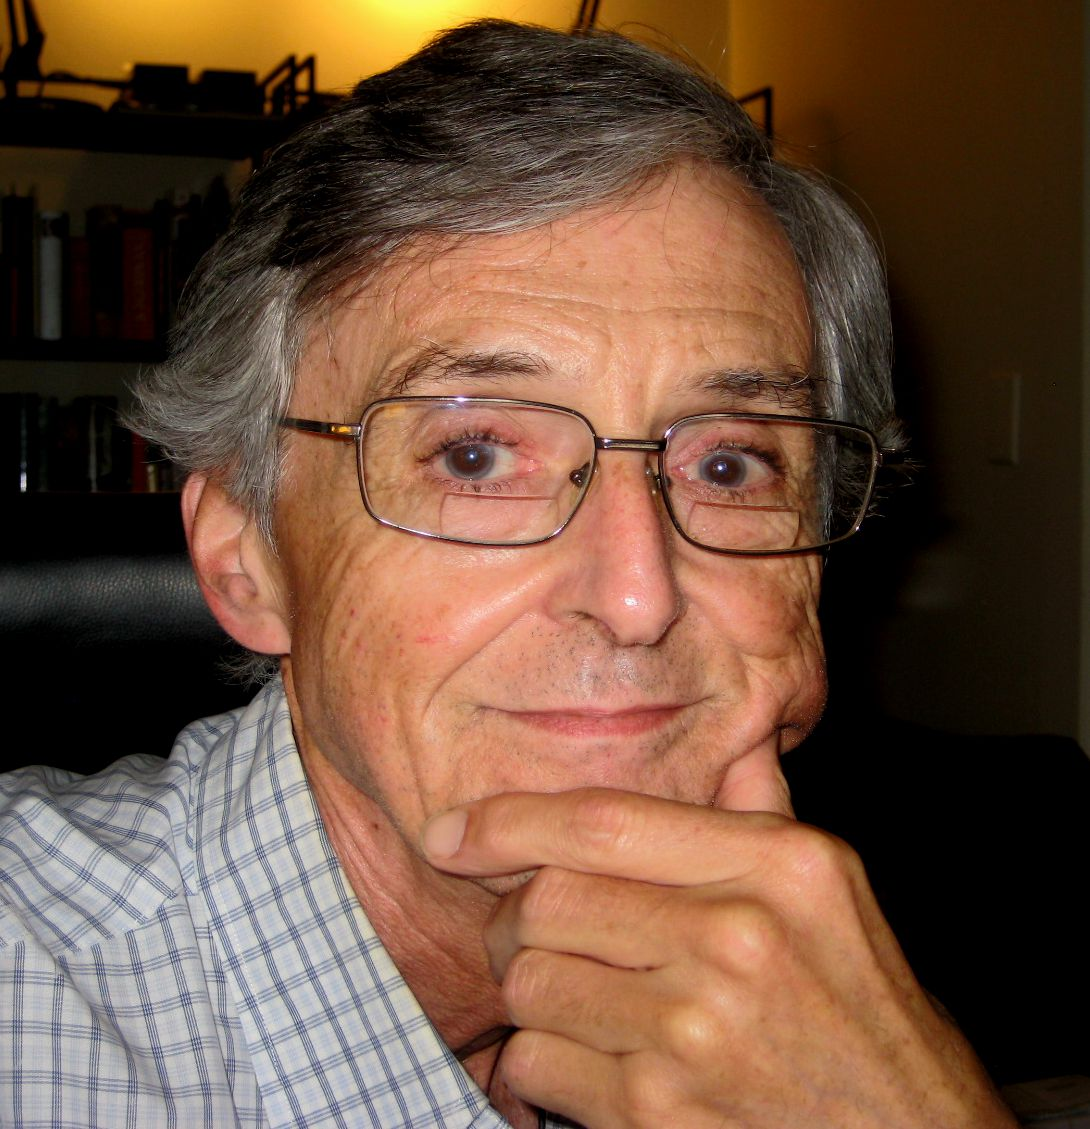 Michael Gury